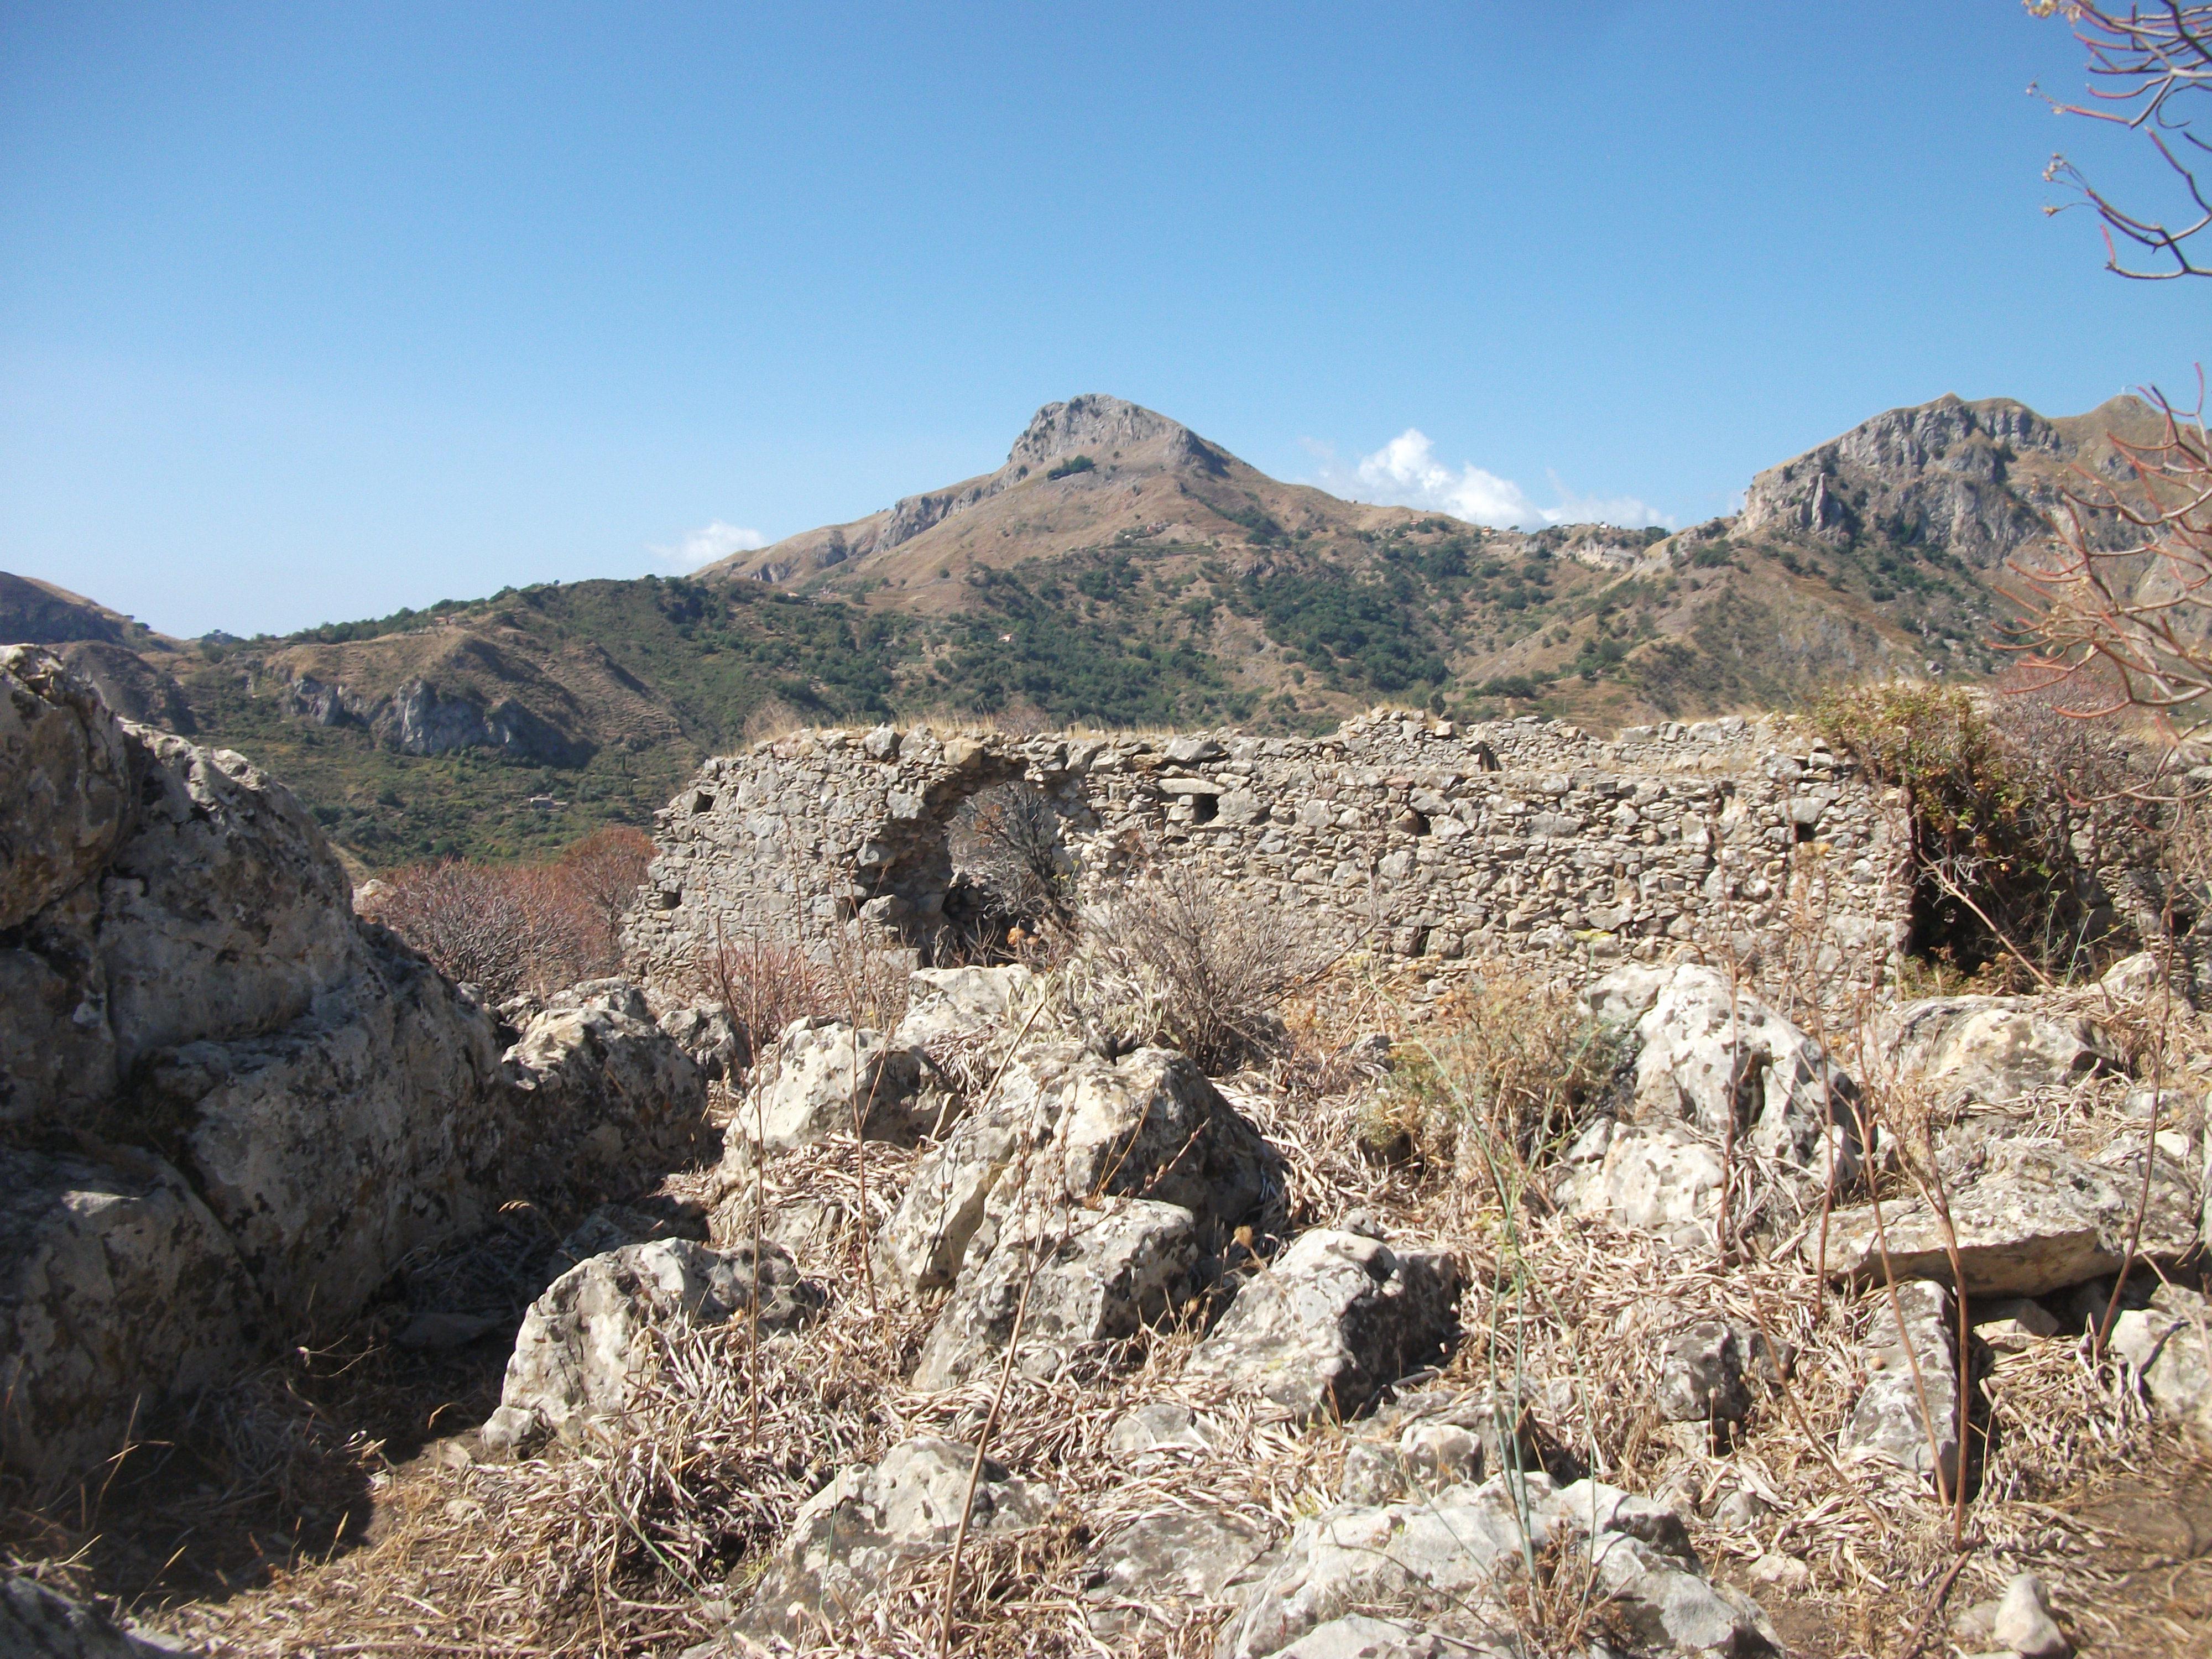 Monte Castellaccio